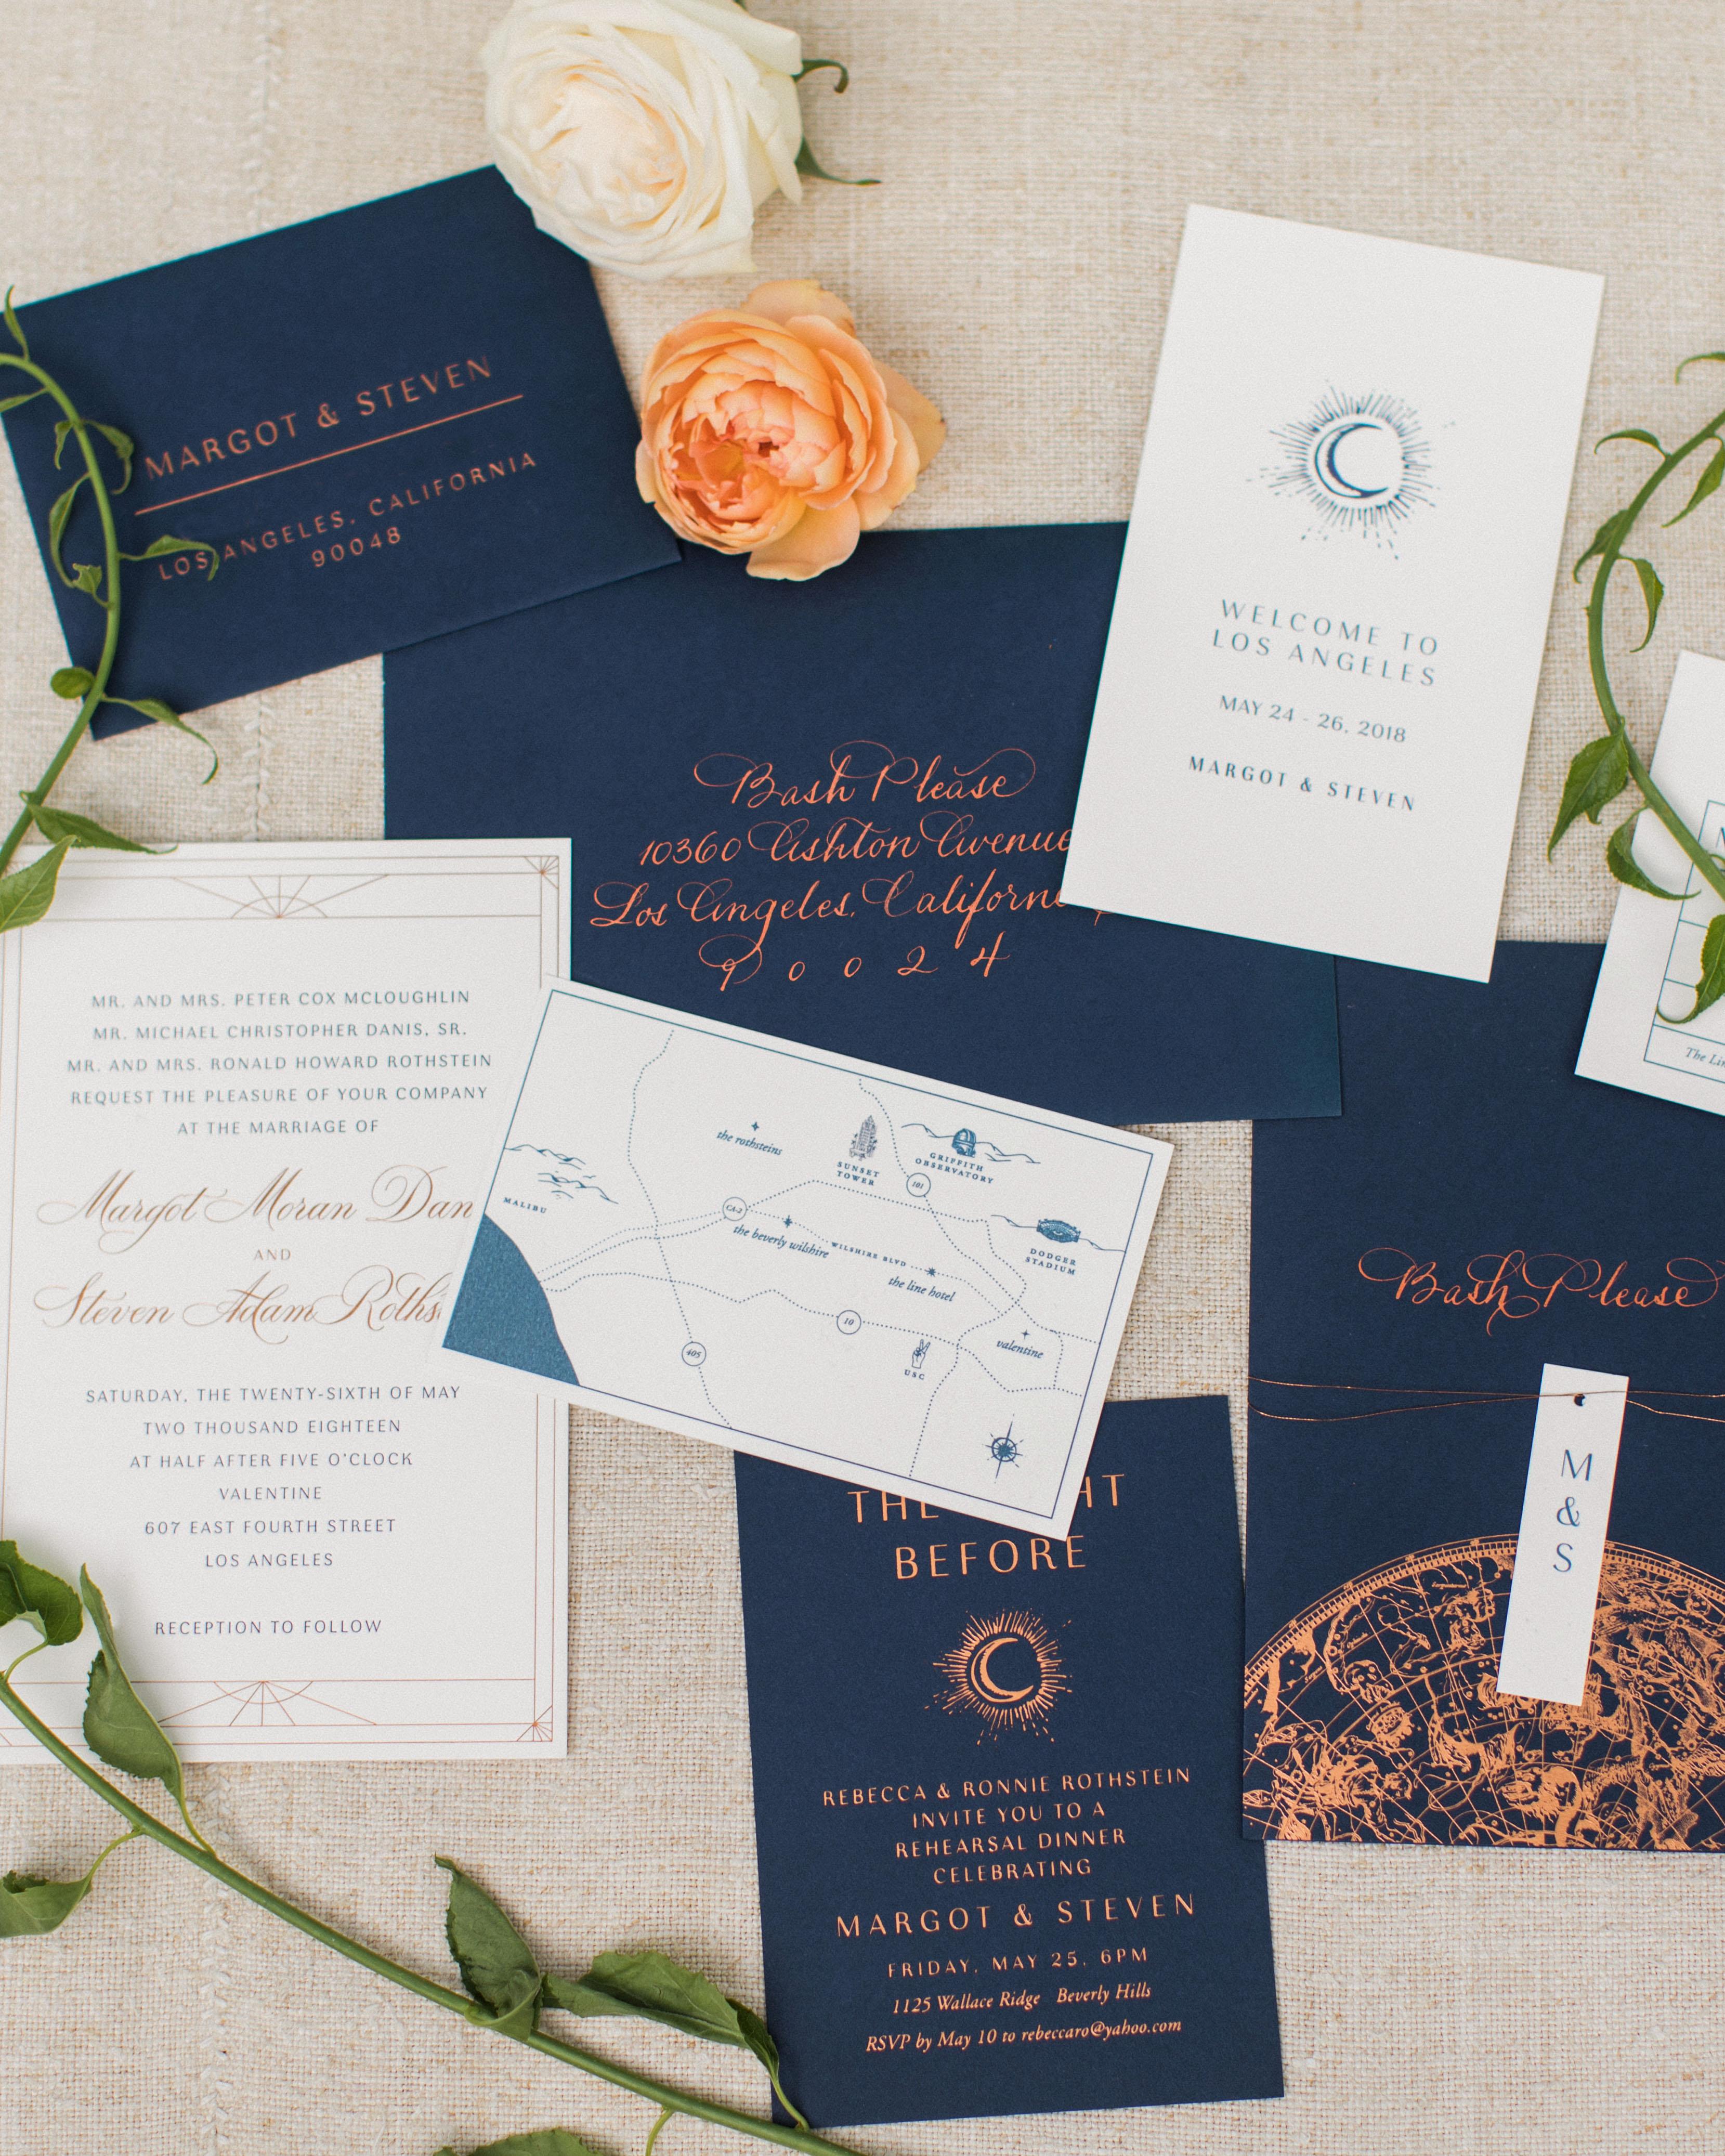 wedding invitation set with ocean inspired details